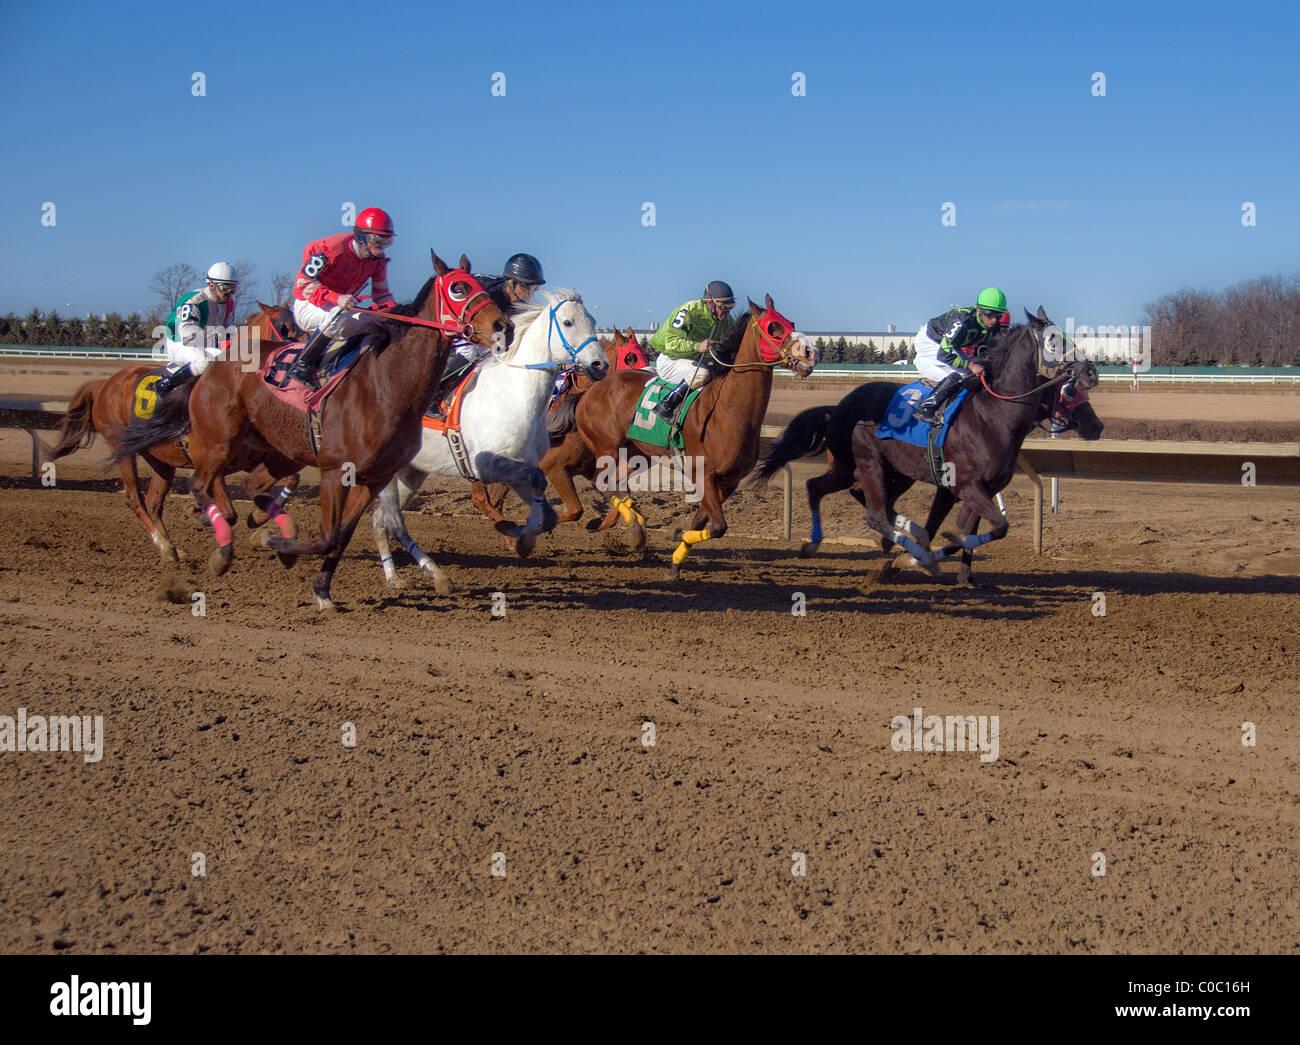 Horse racing Ohio USA - Stock Image